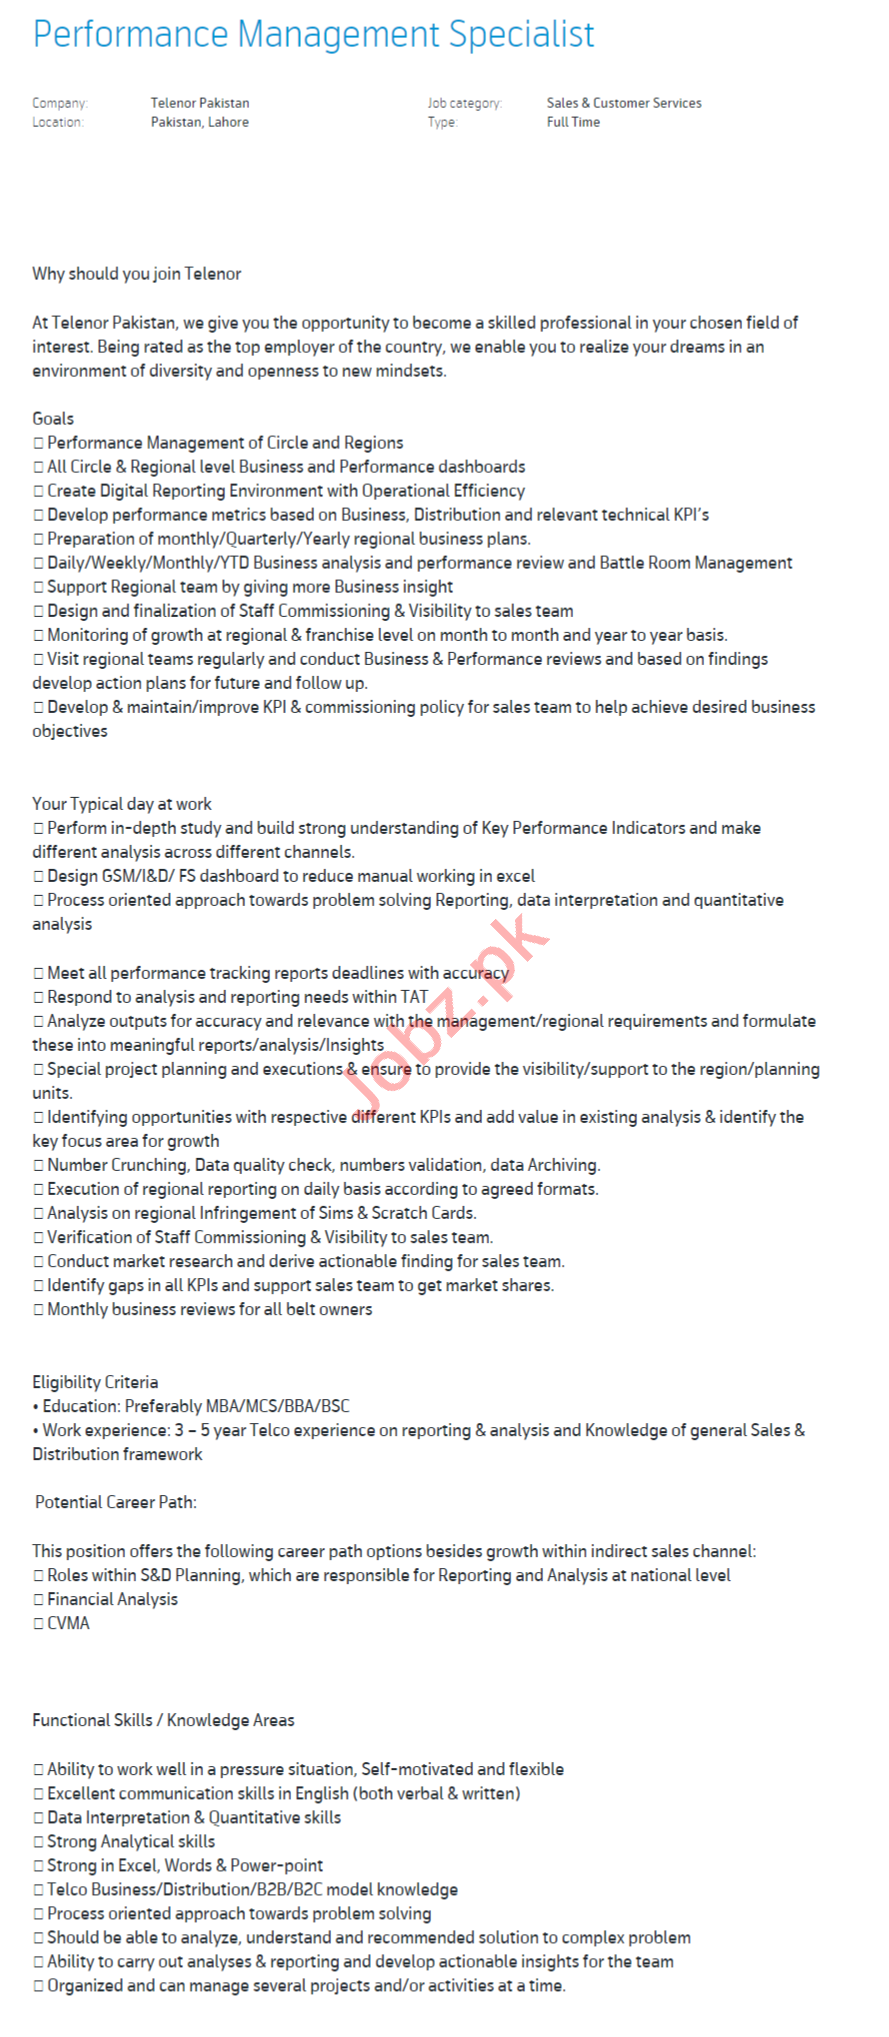 Performance Management Specialist Jobs in Telenor Pakistan